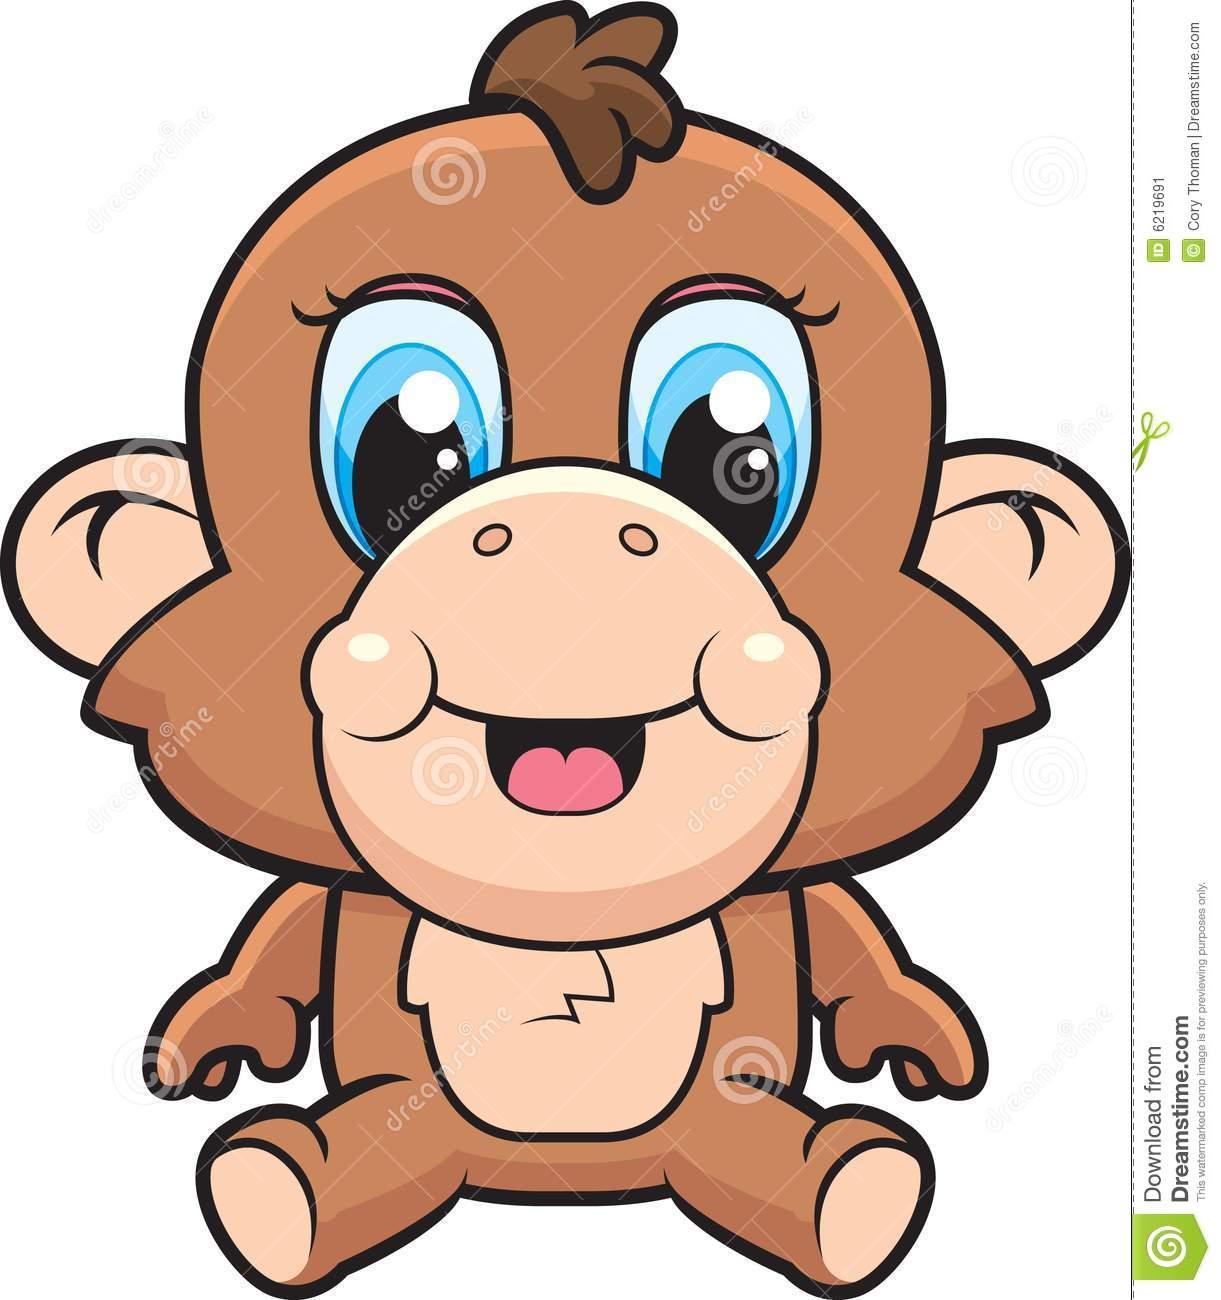 Cute Cartoon Monkey Love